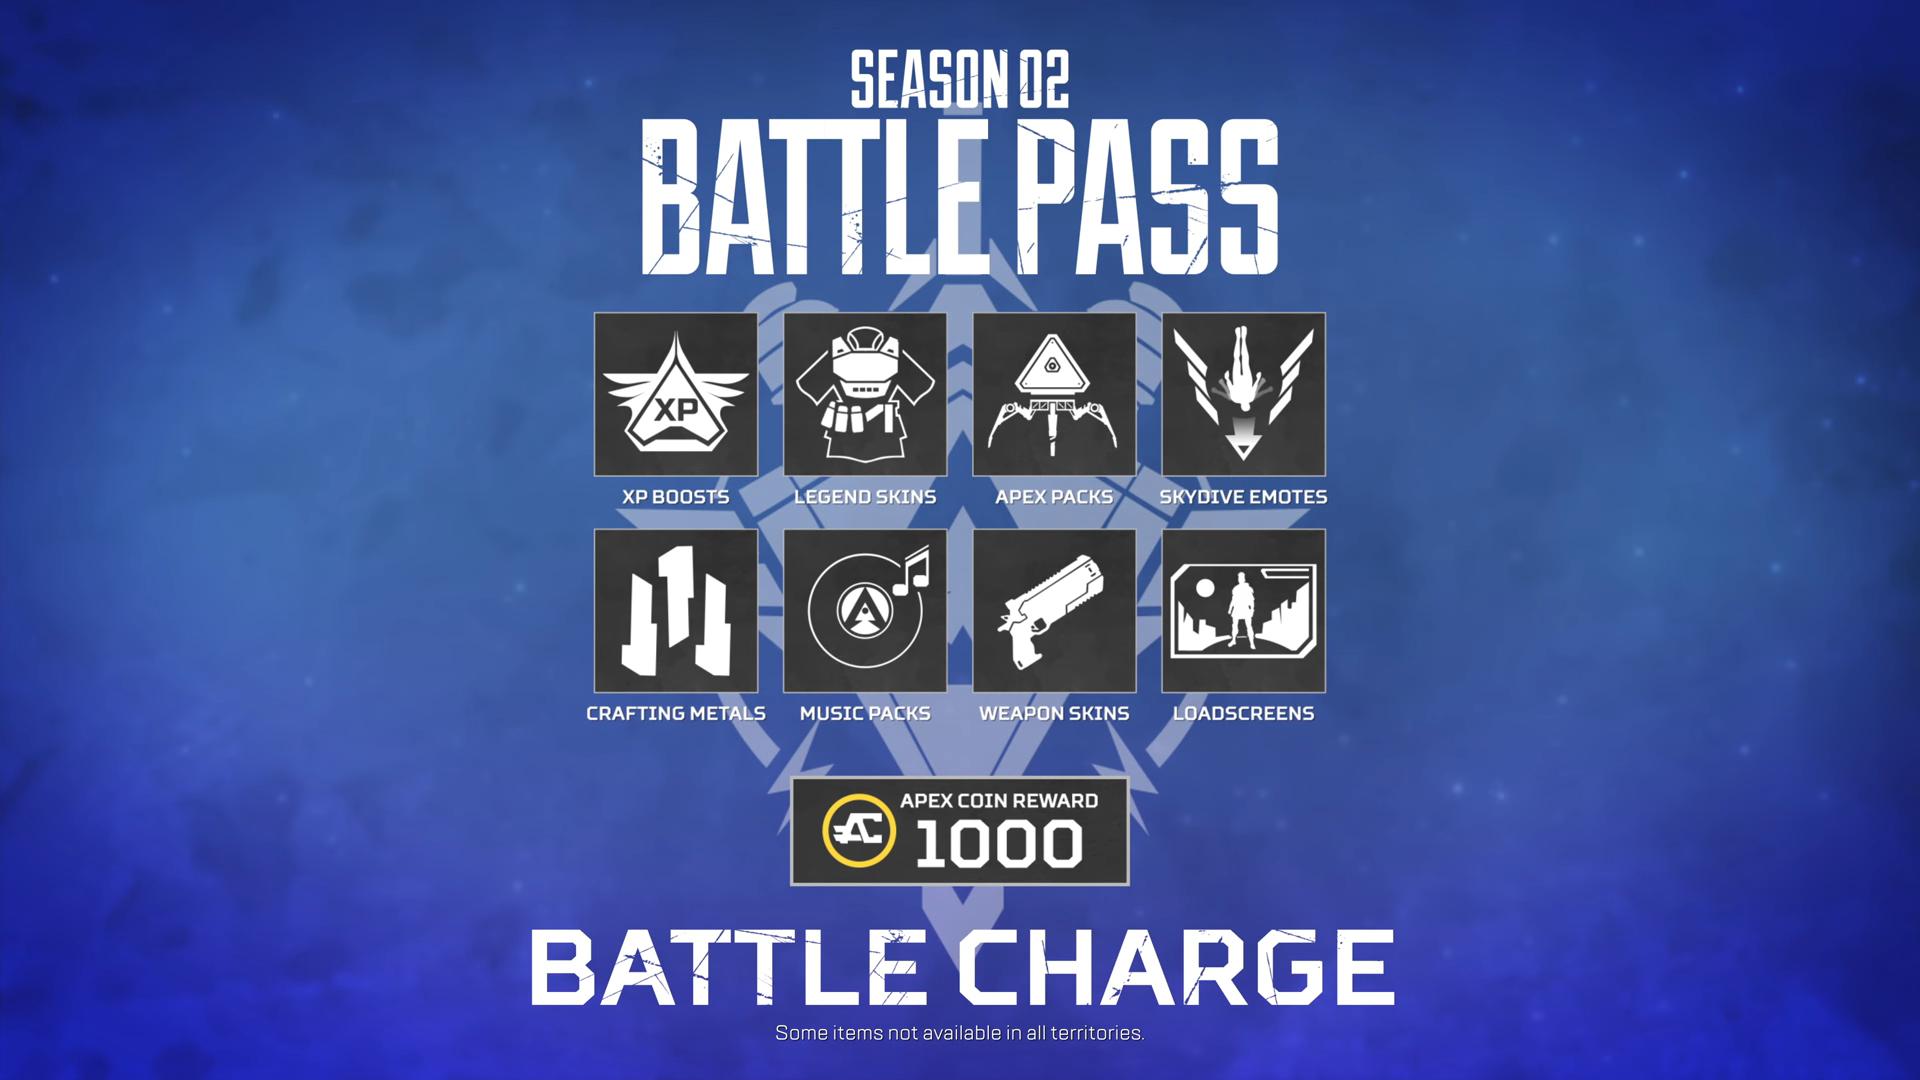 Apex Legends challenges guide: All the Season 2 battle pass